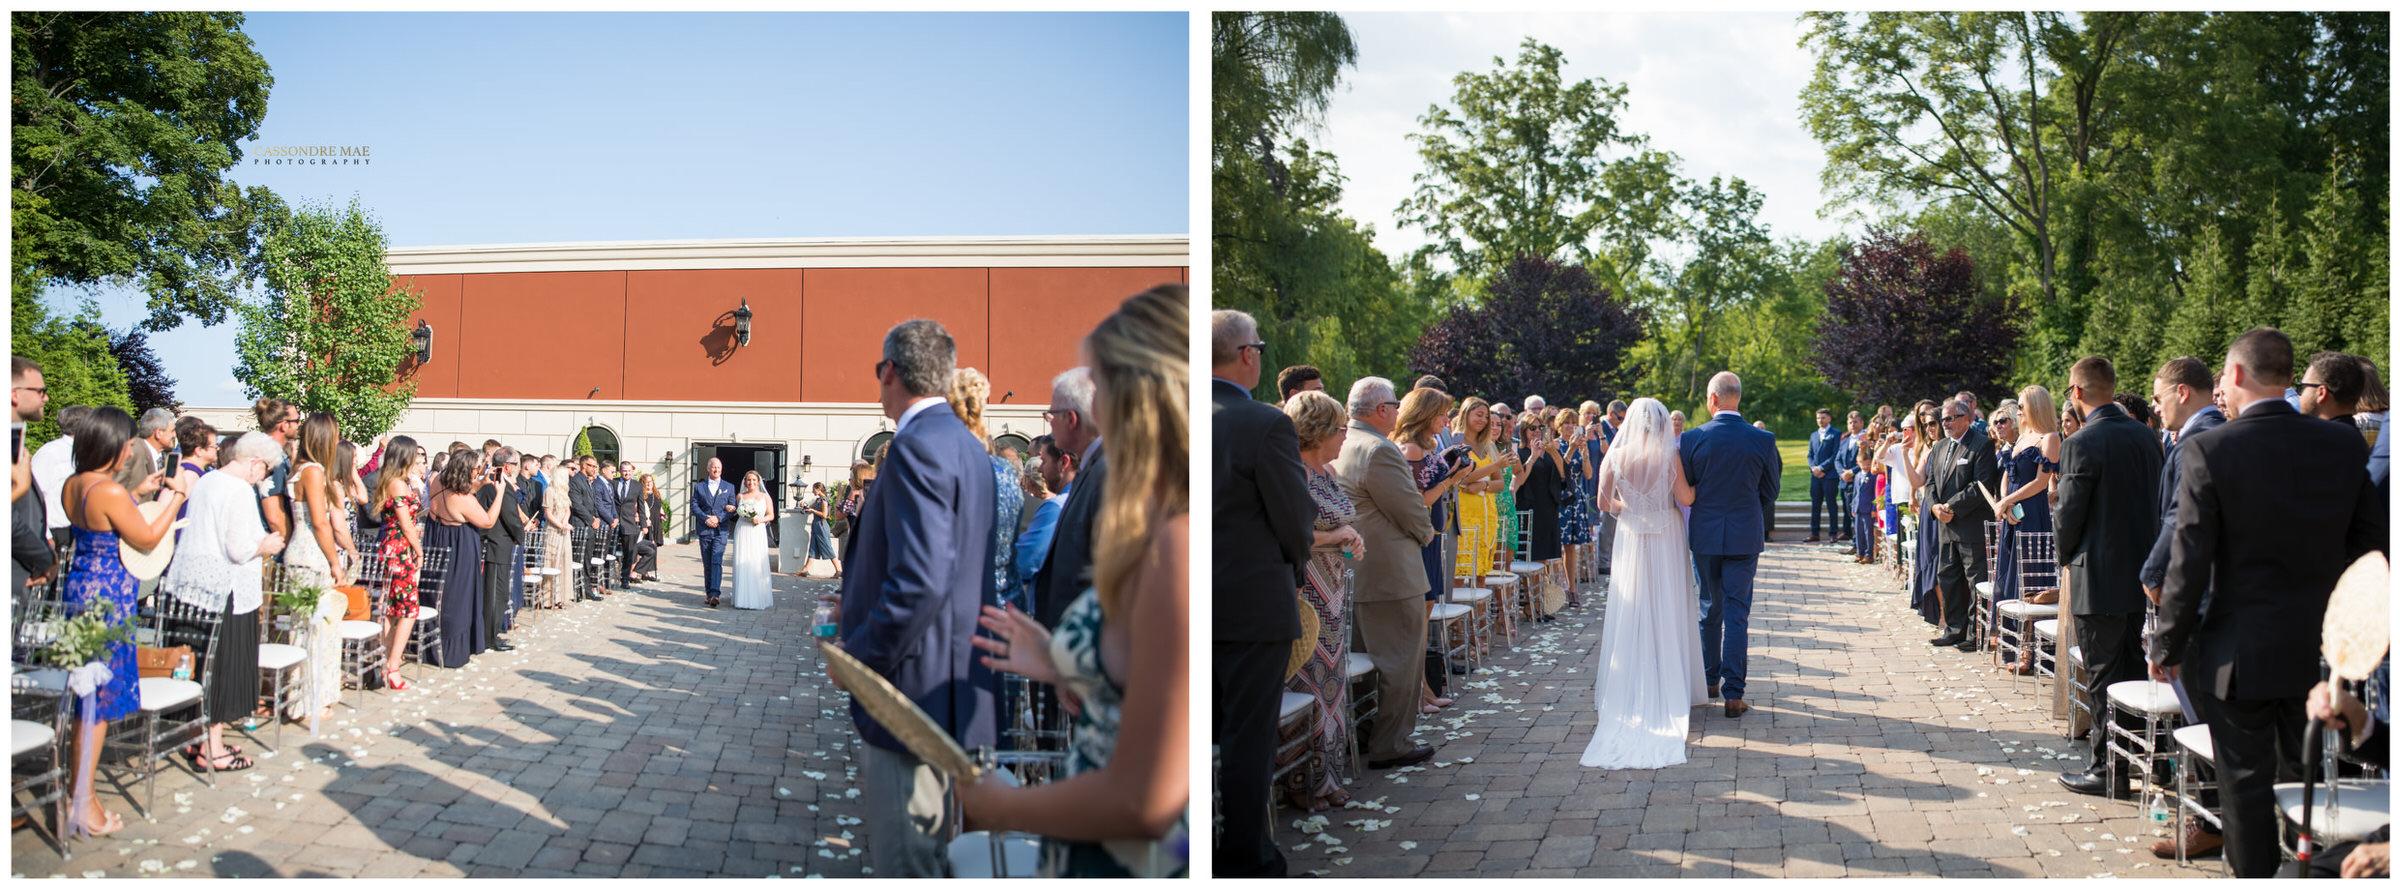 Cassondre Mae Photography Villa Venezia Wedding Photographer 10.jpg